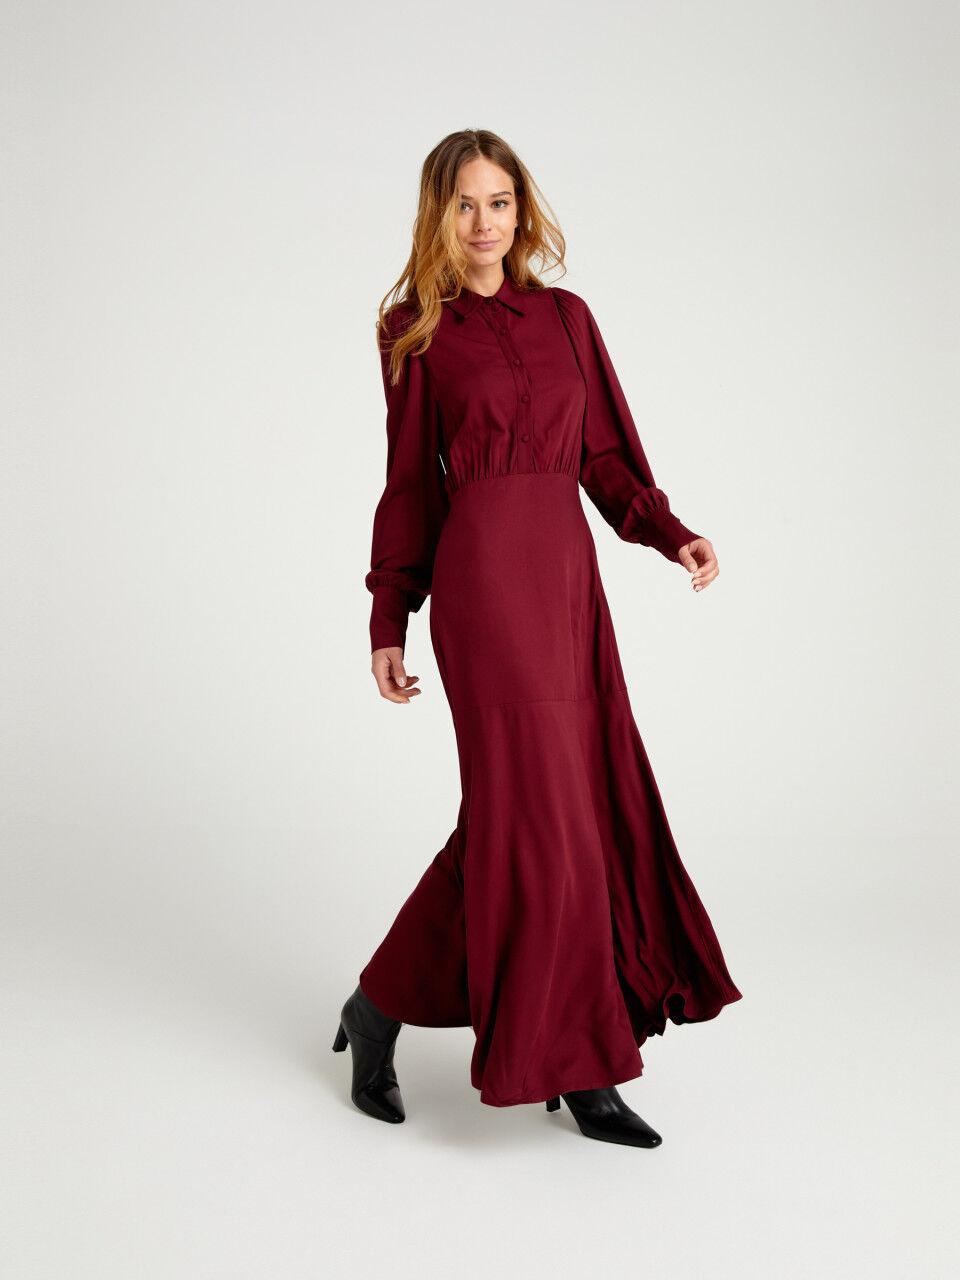 Langes schlitz rotes kleid mit Rotes langes